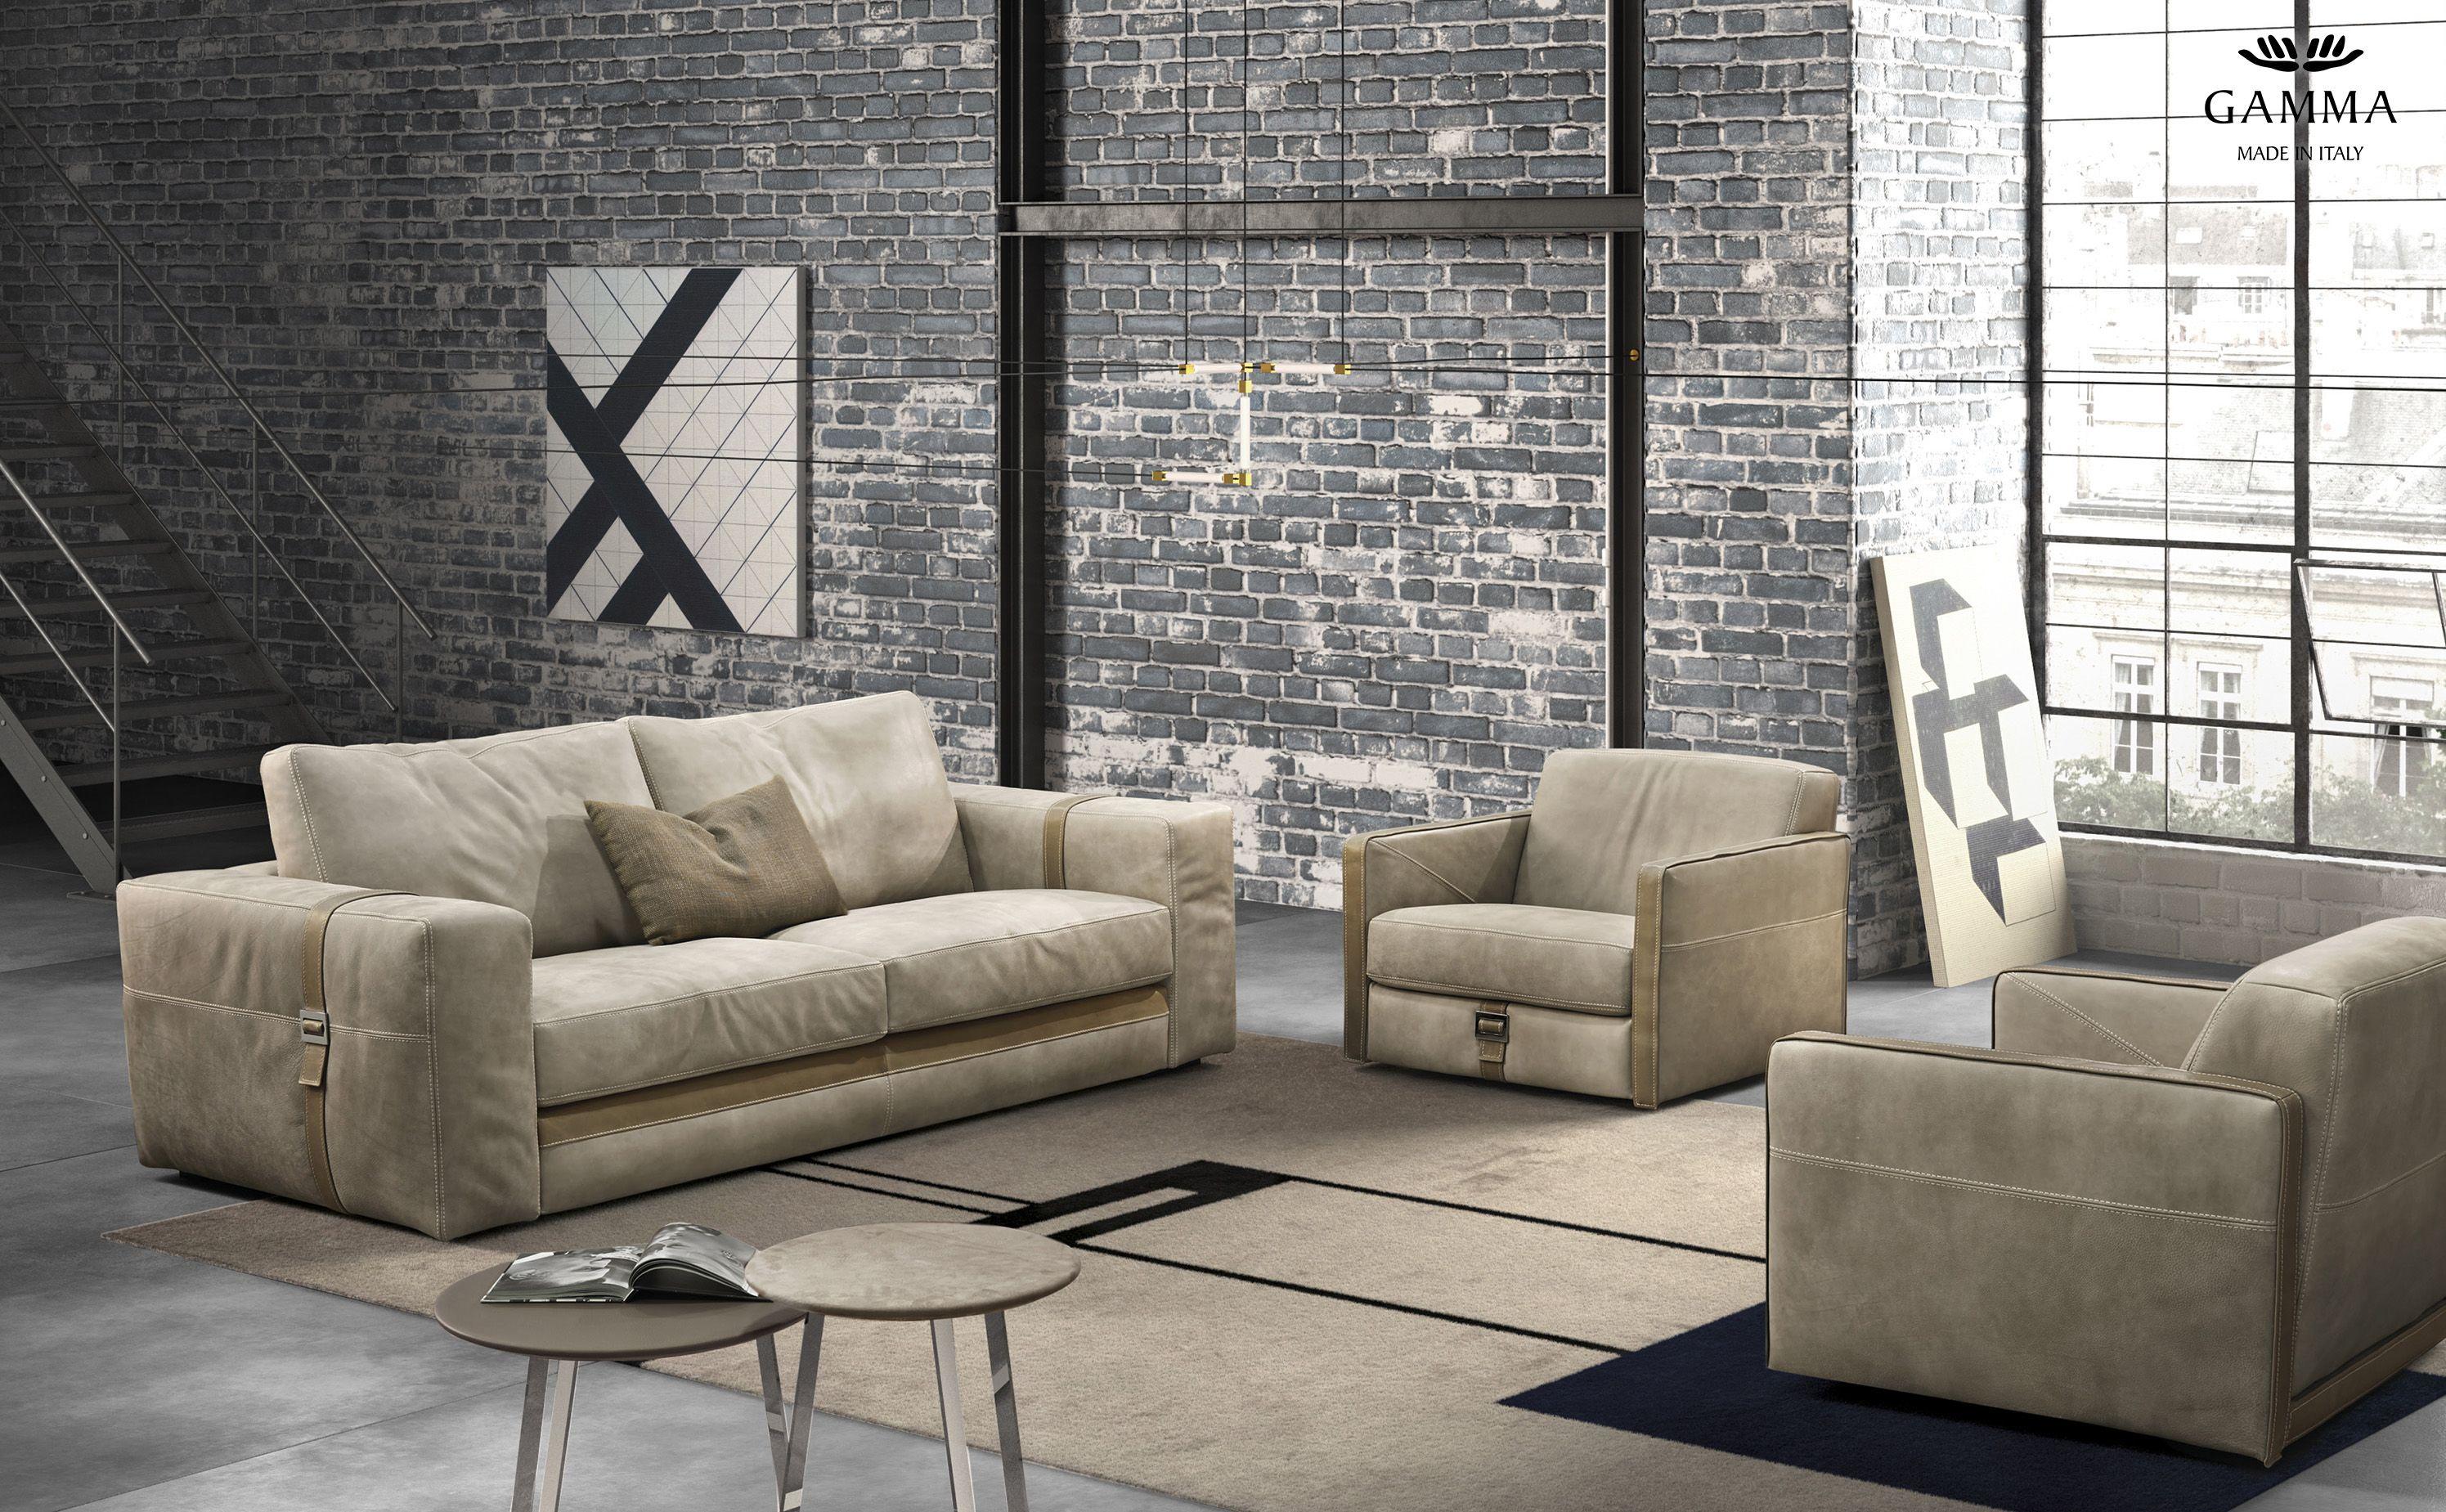 Richmond Sofa Gammaarredamenti Gamma Madeinitaly Italy Design  # Muebles Lozano Sofas